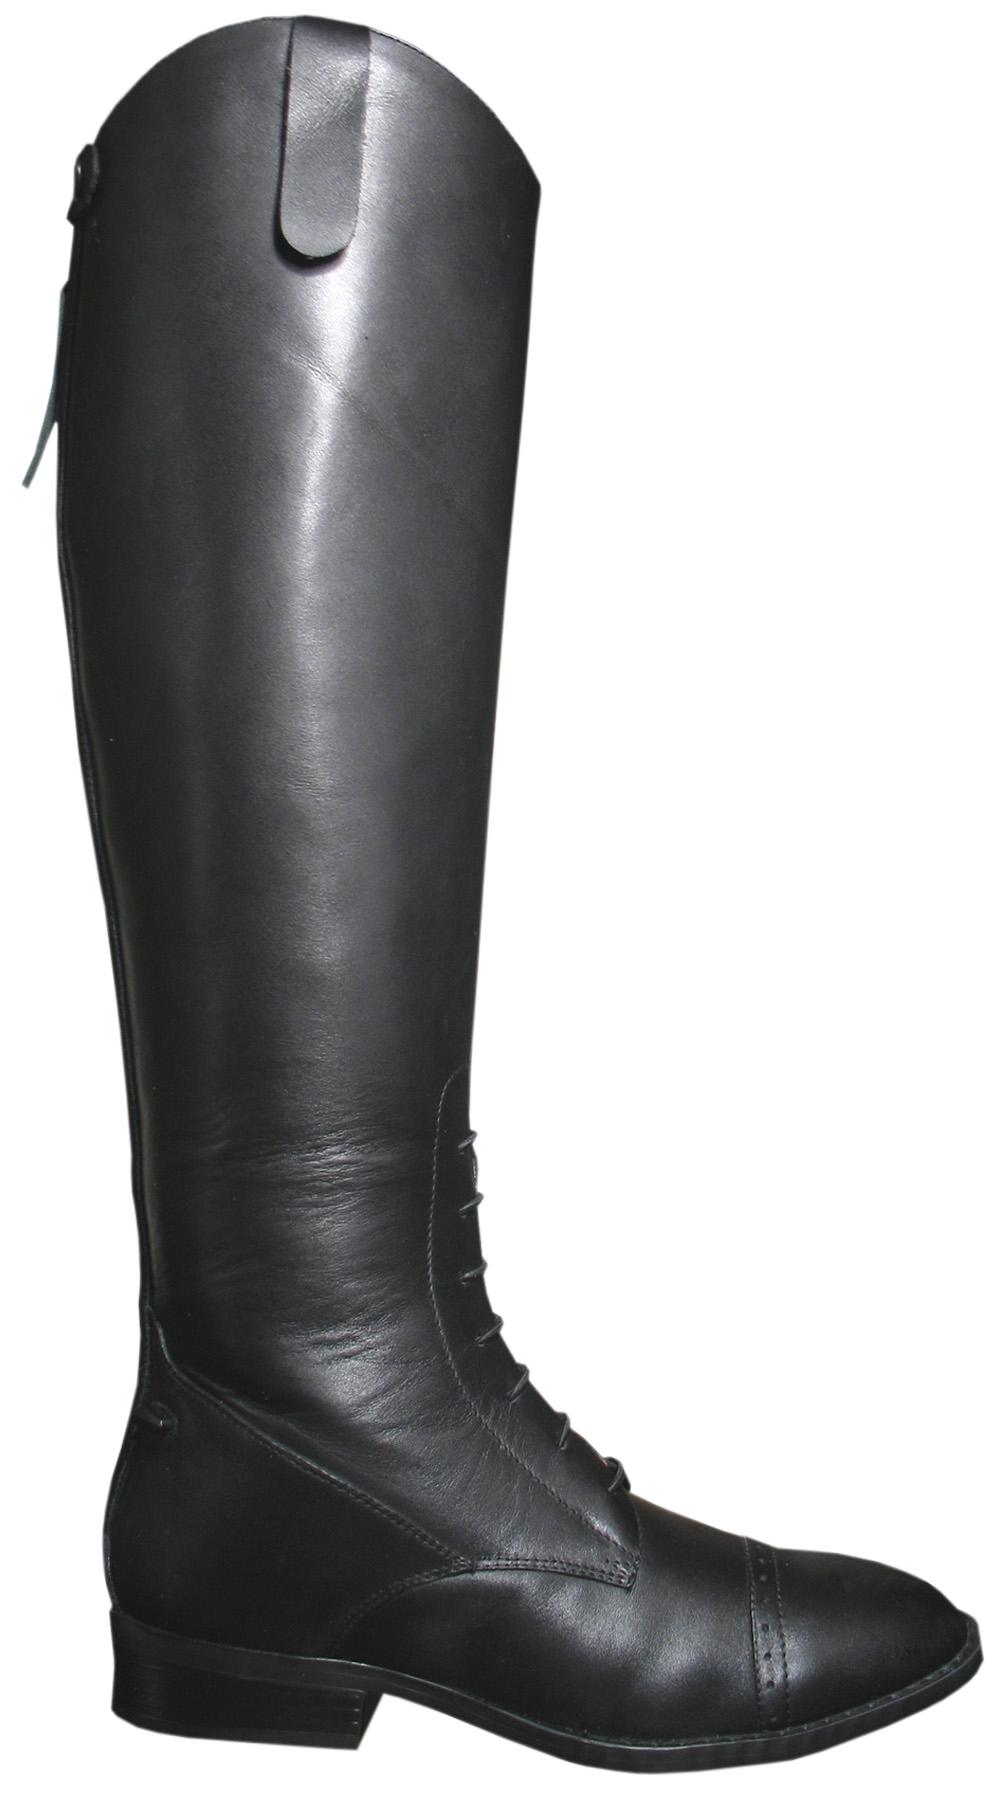 0cb0d84dba3 Pungo Ridge - Smoky Mountain Women's Short Leather Field Boot ...